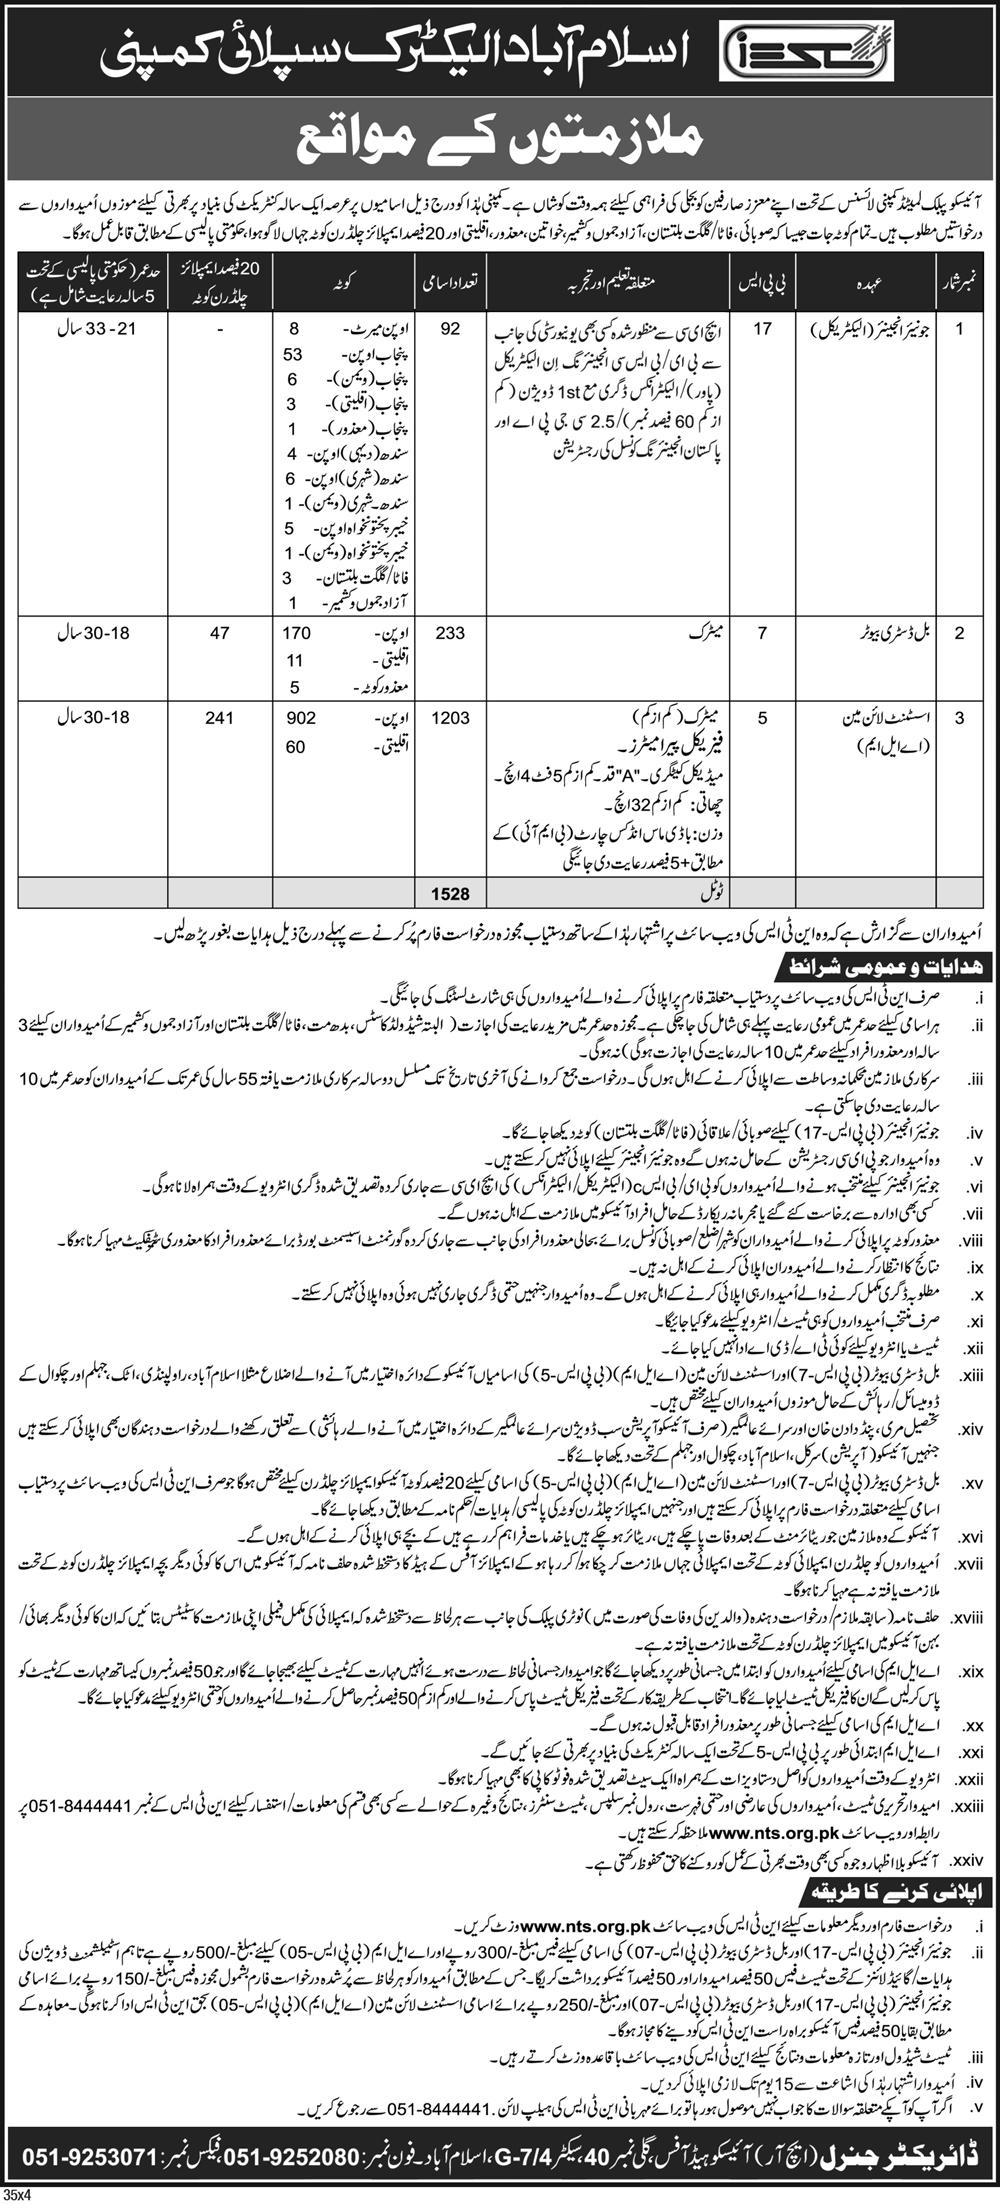 Islamabad Electric Supply Company IESCO Jobs Via NTS